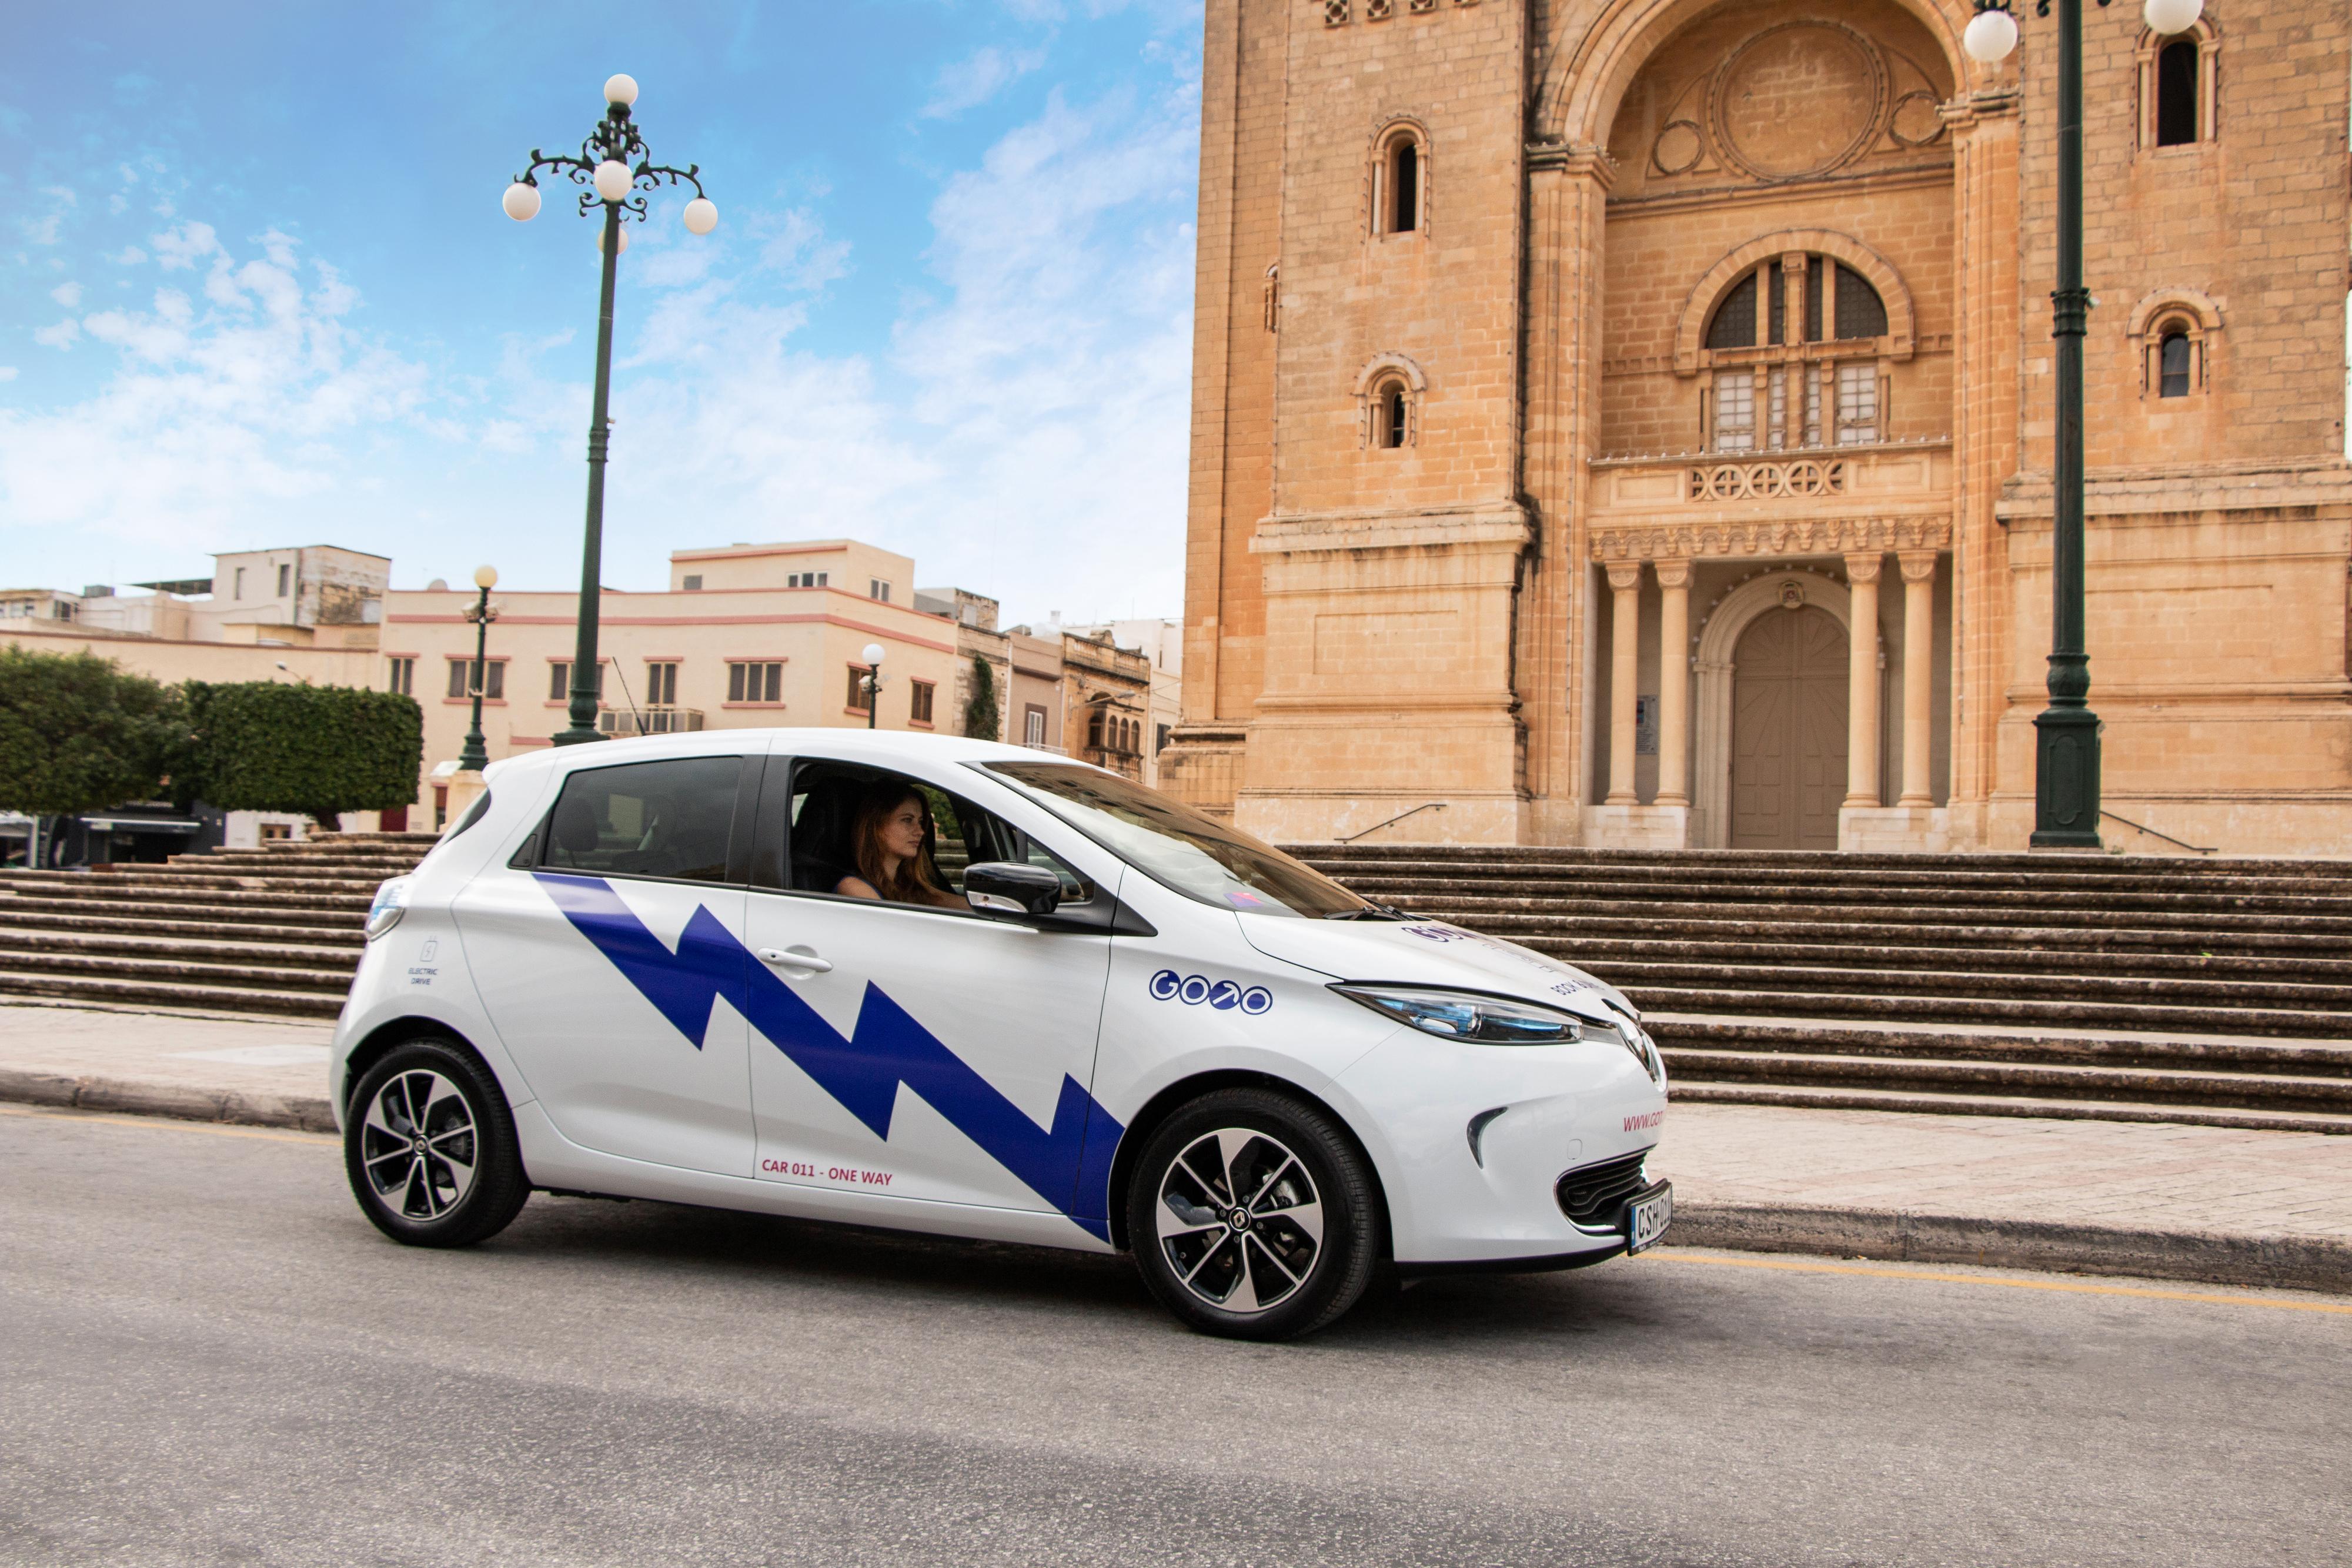 renault_zoe_malta_car_sharing_electric_motor_news_05